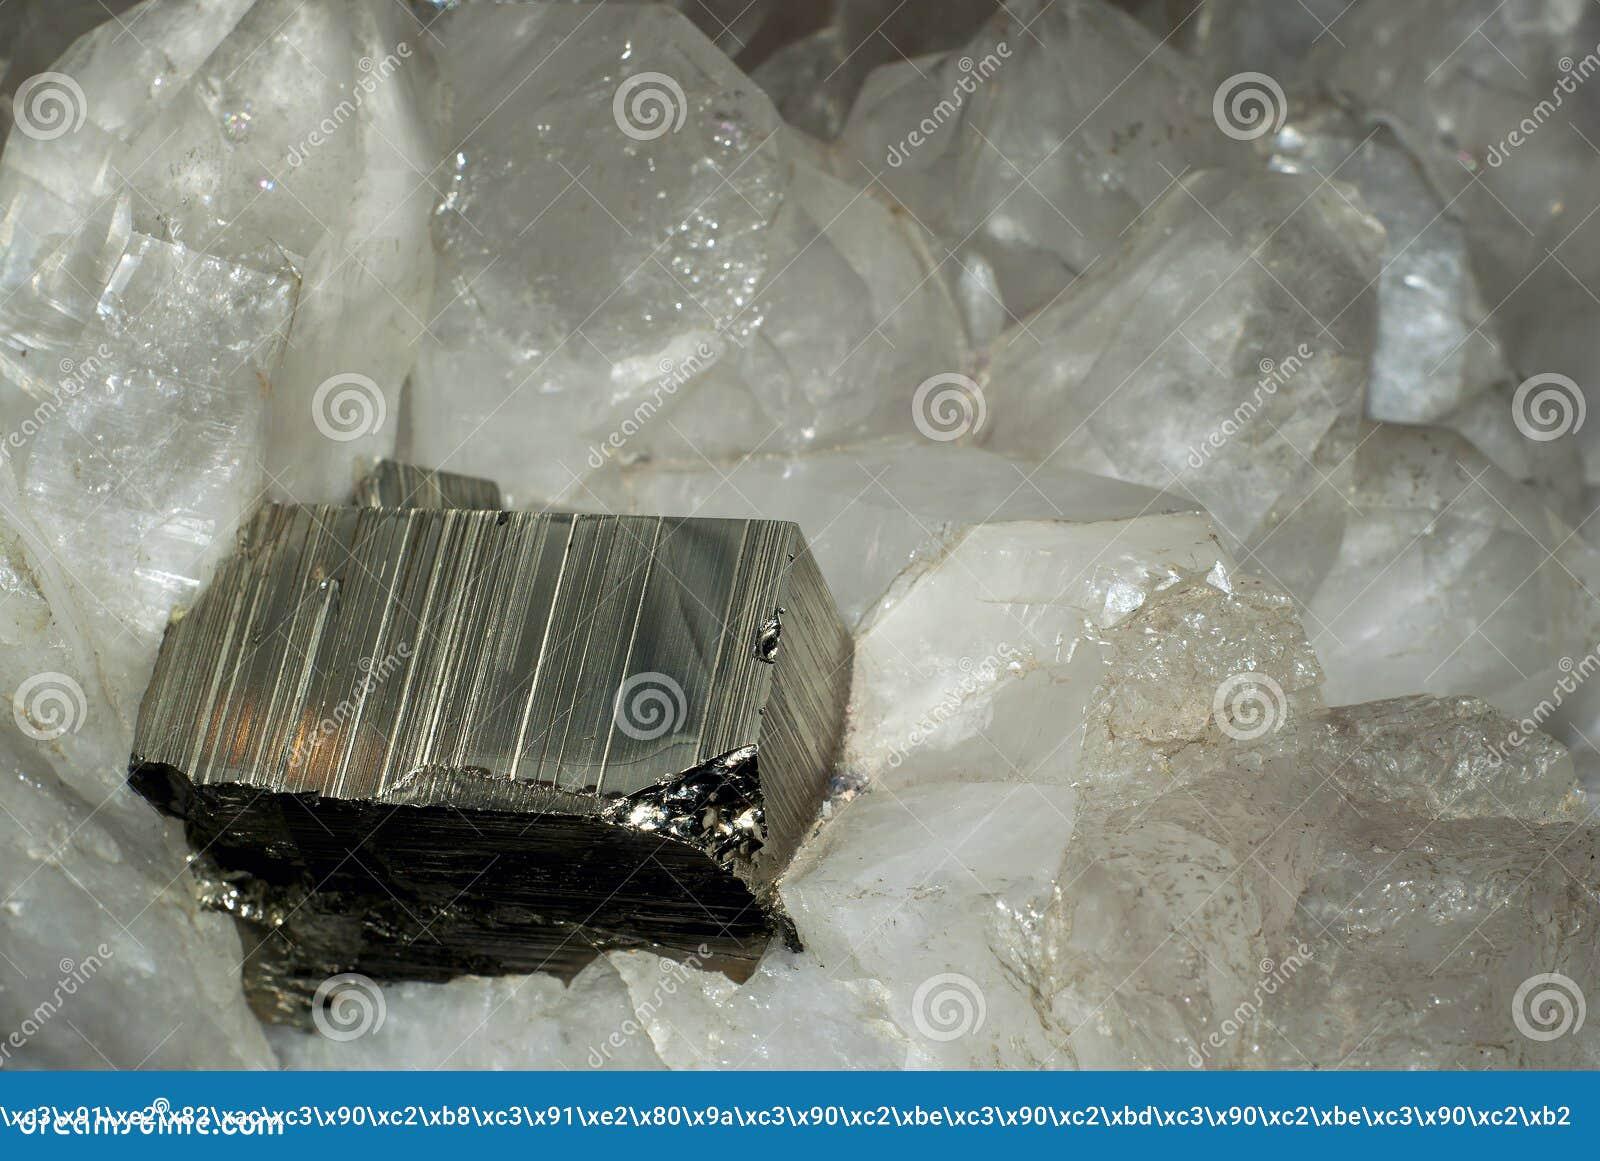 Het pyrietkristal in rotskristal drusen